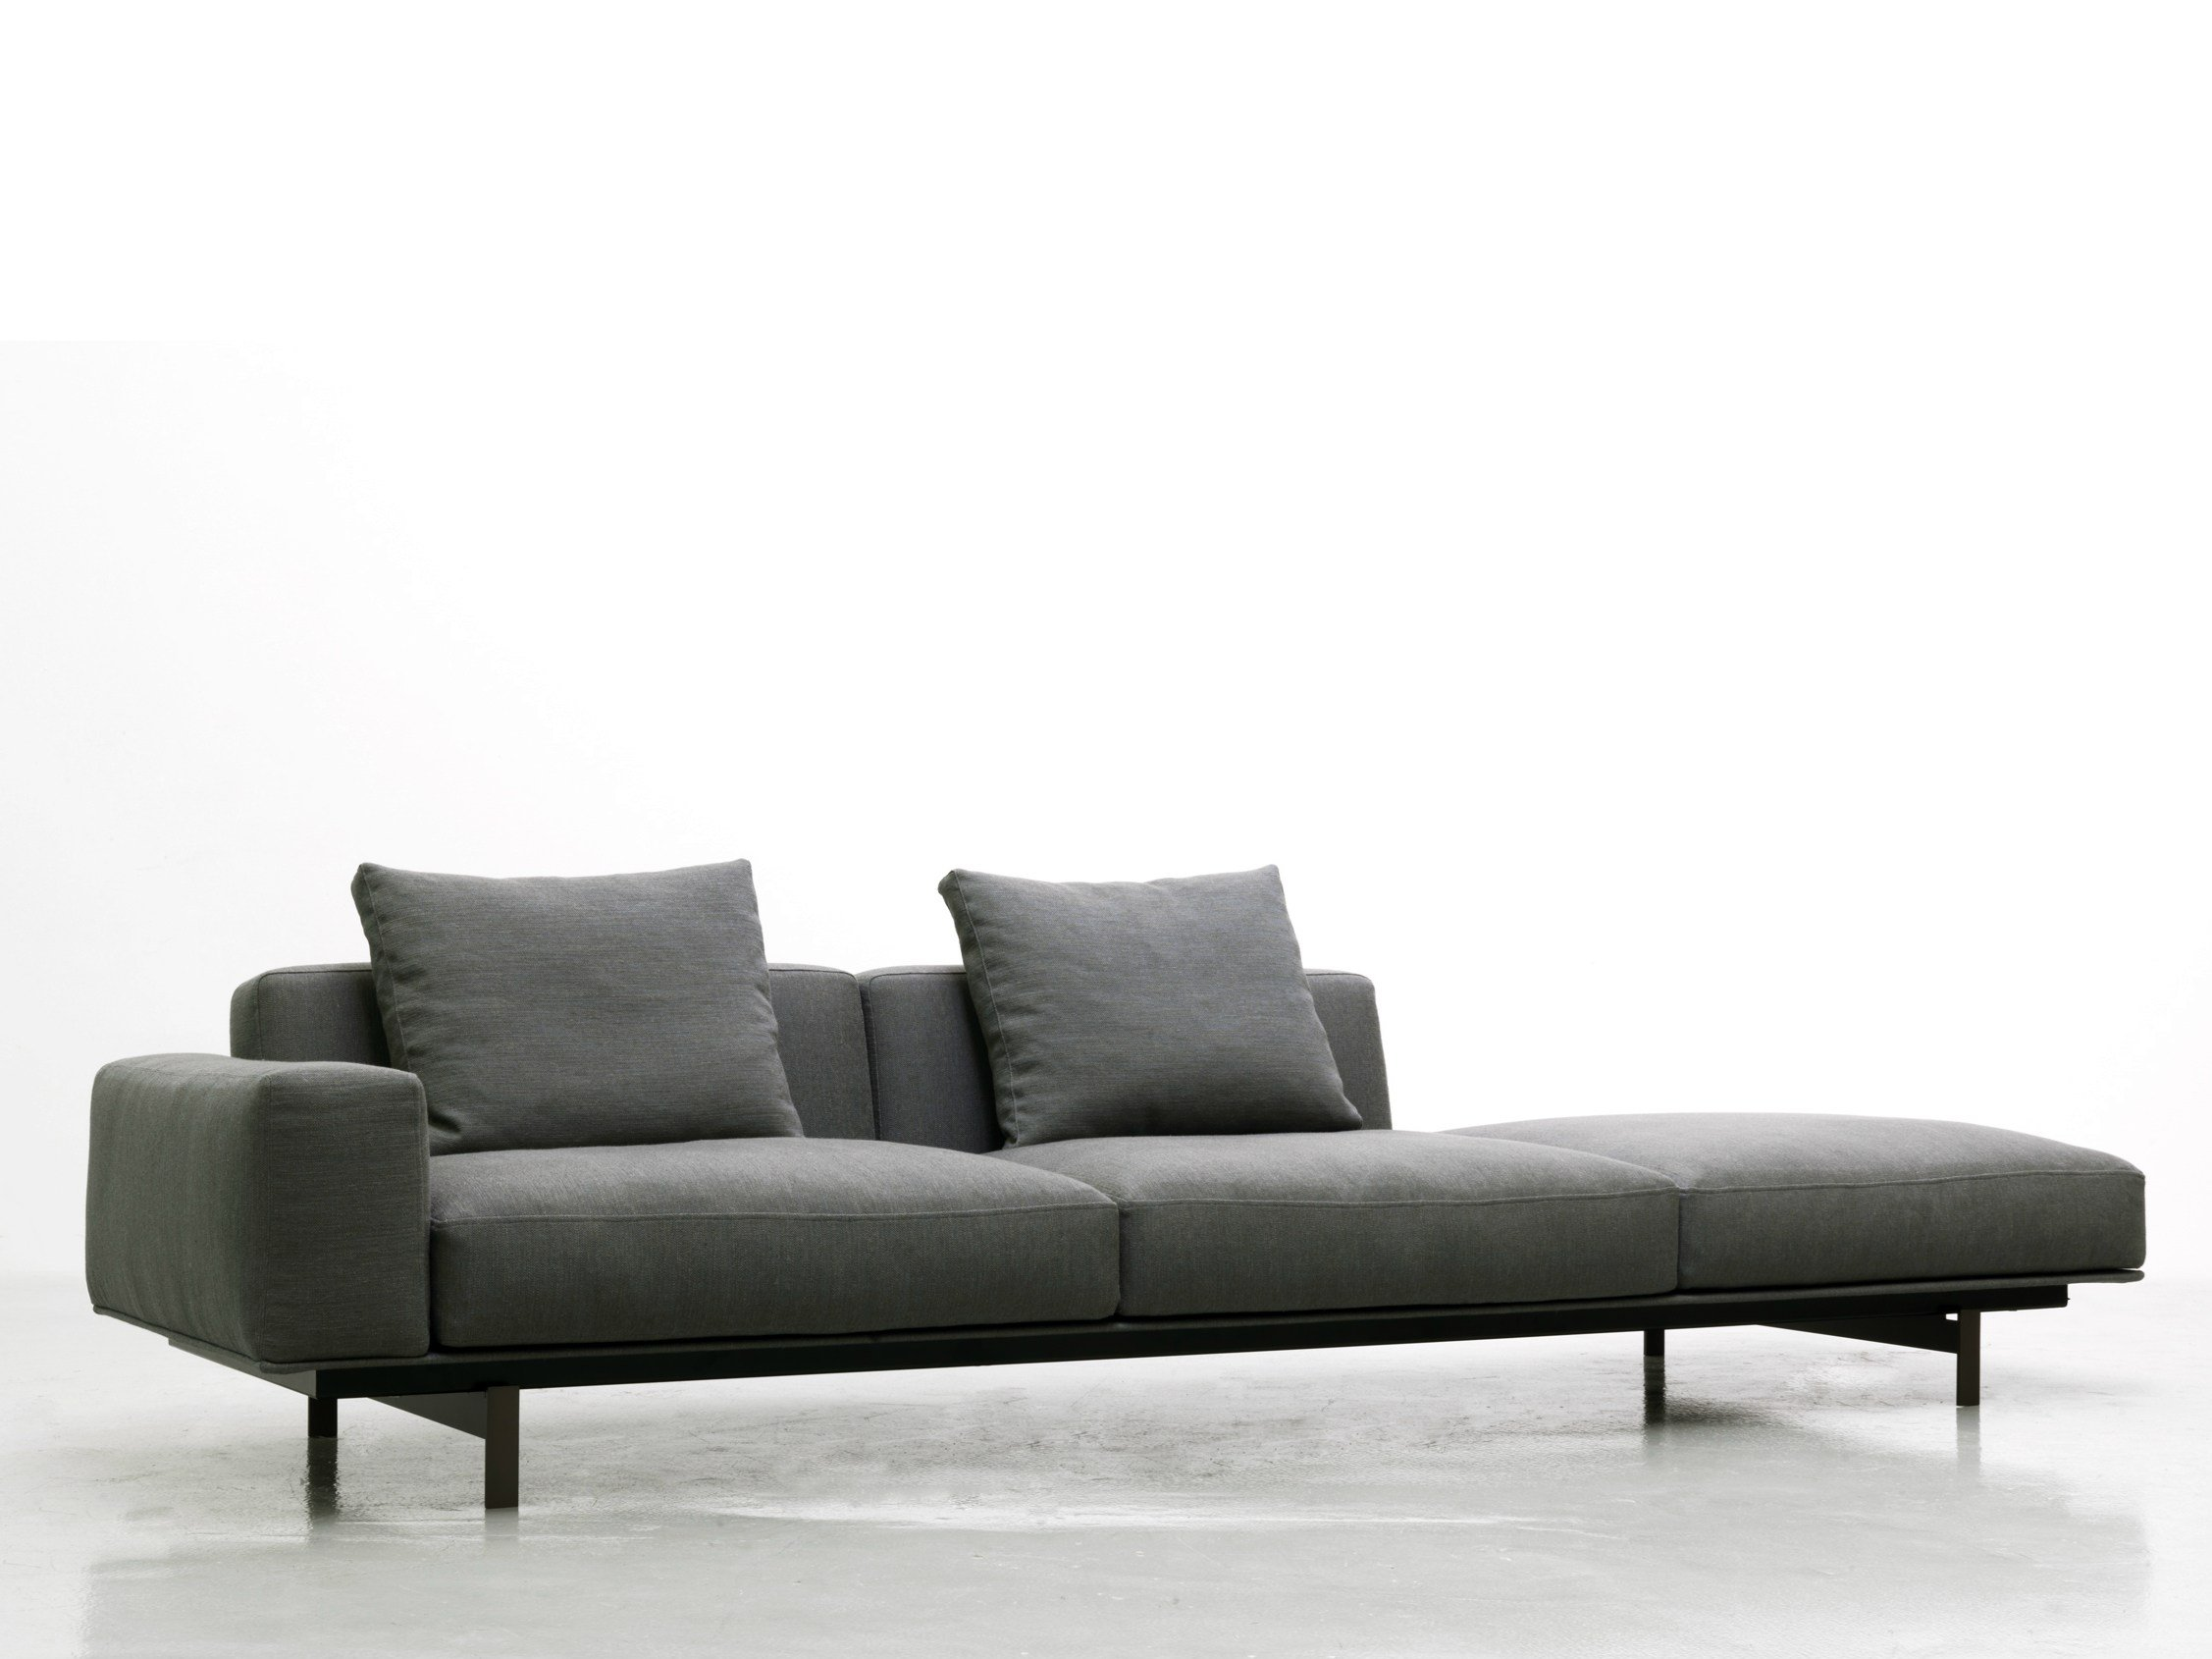 Yard Sofa by Francesco Rota for Lema